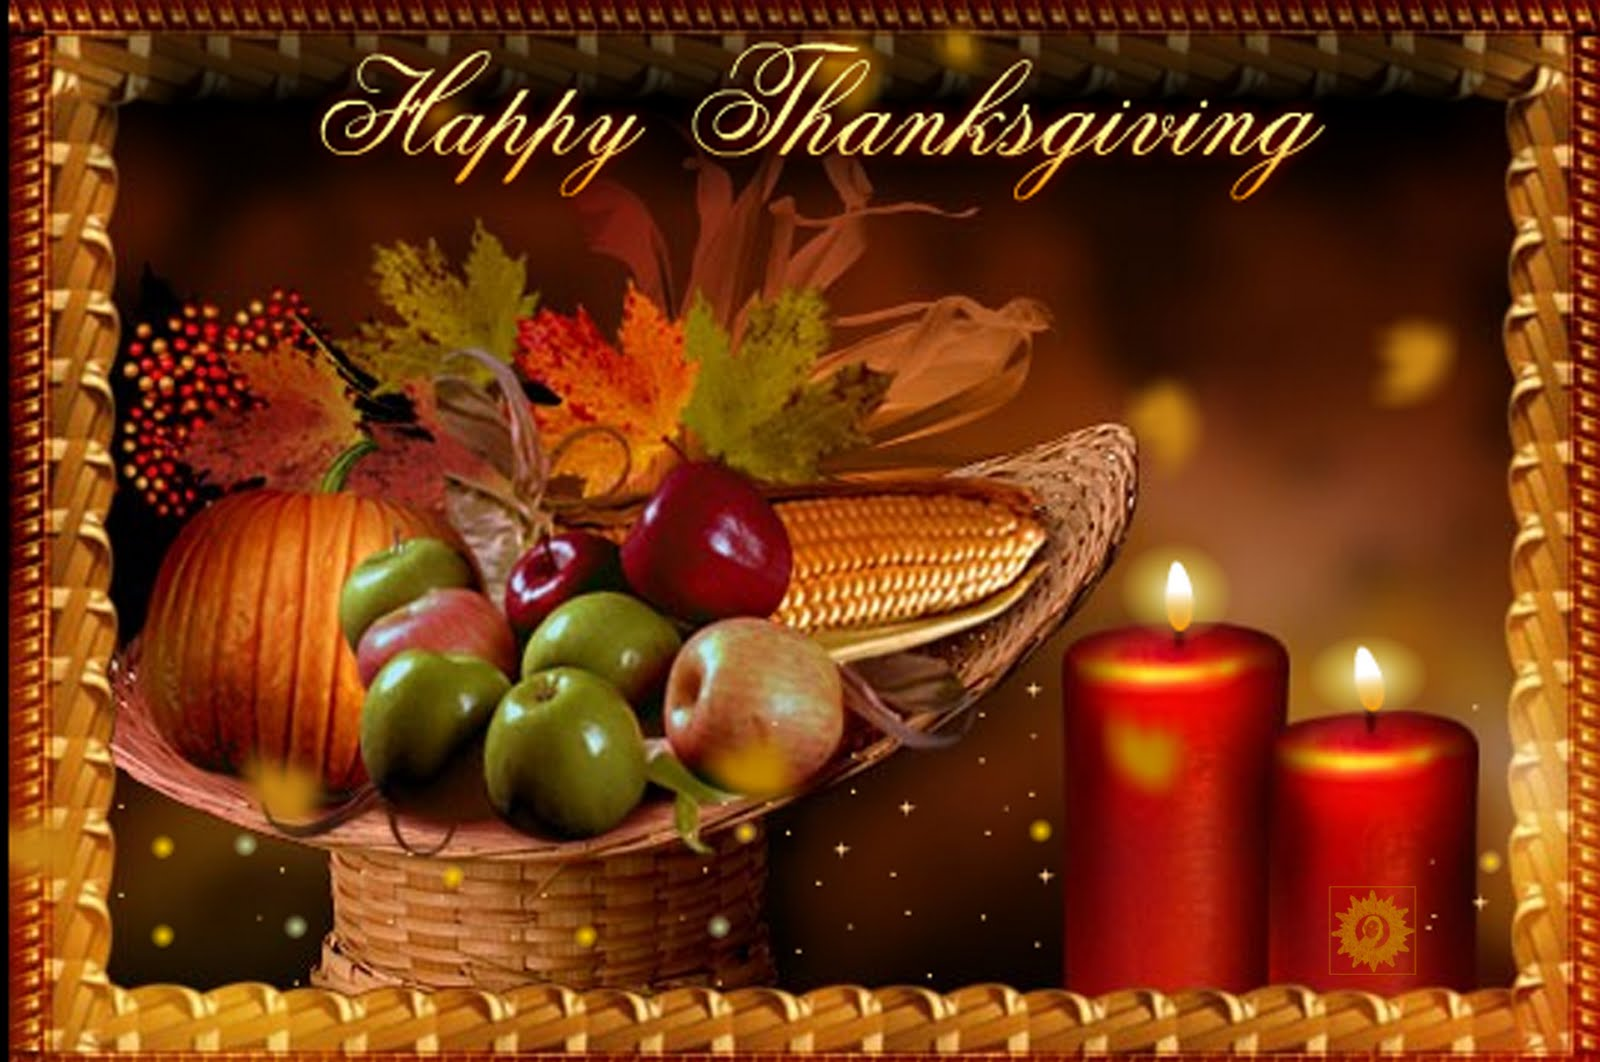 Thanksgiving Wallpapers: Thanksgiving PC Wallpapers, Thanksgiving PC ...